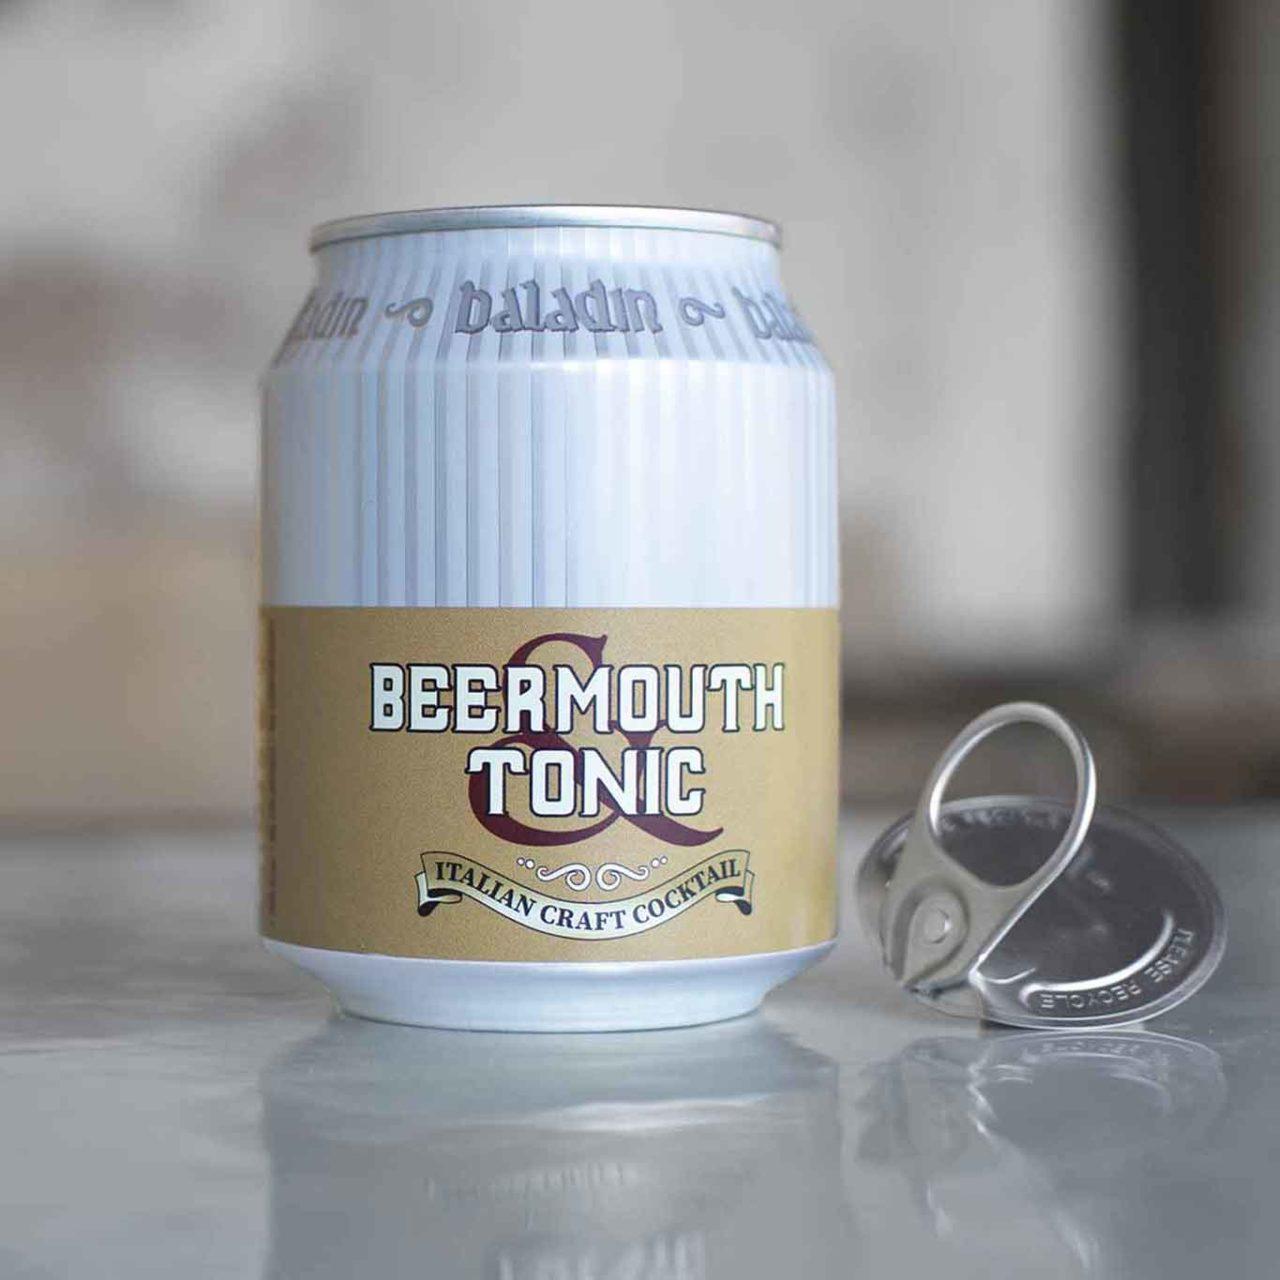 Baladin beermouth tonic